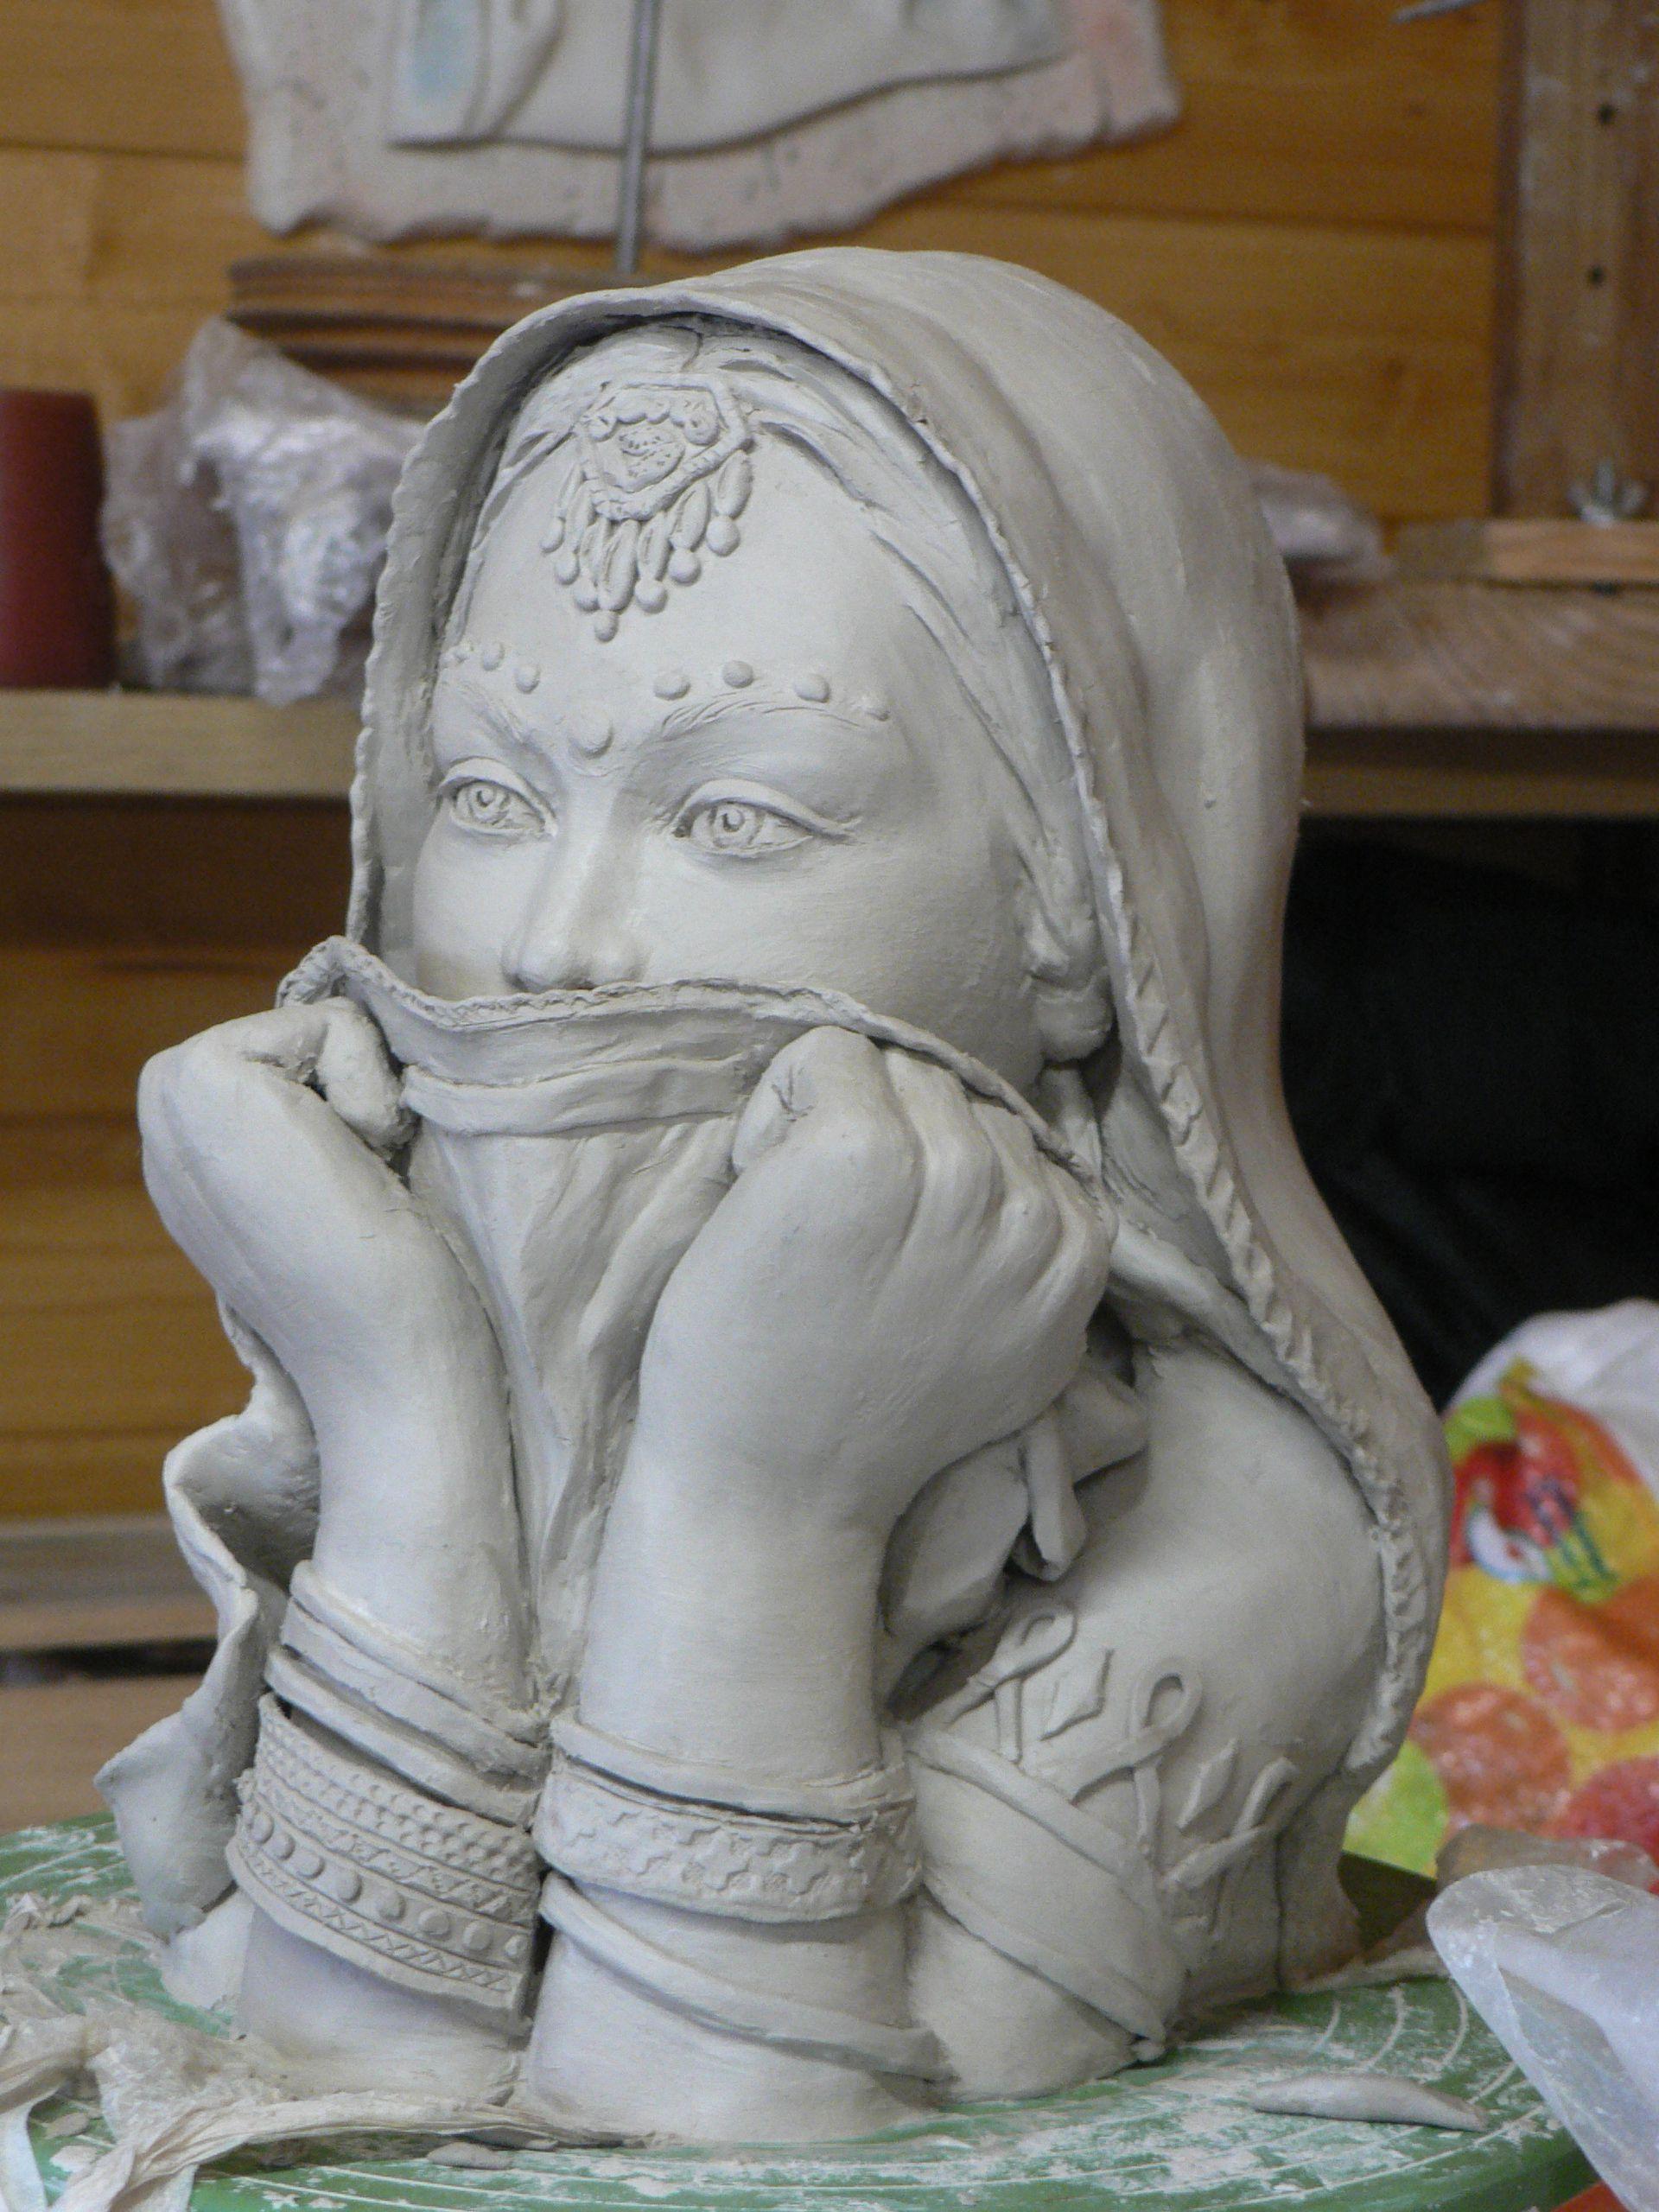 Relativ peggysculpture femme indoue | Statues & Sculptures | Pinterest  EH85